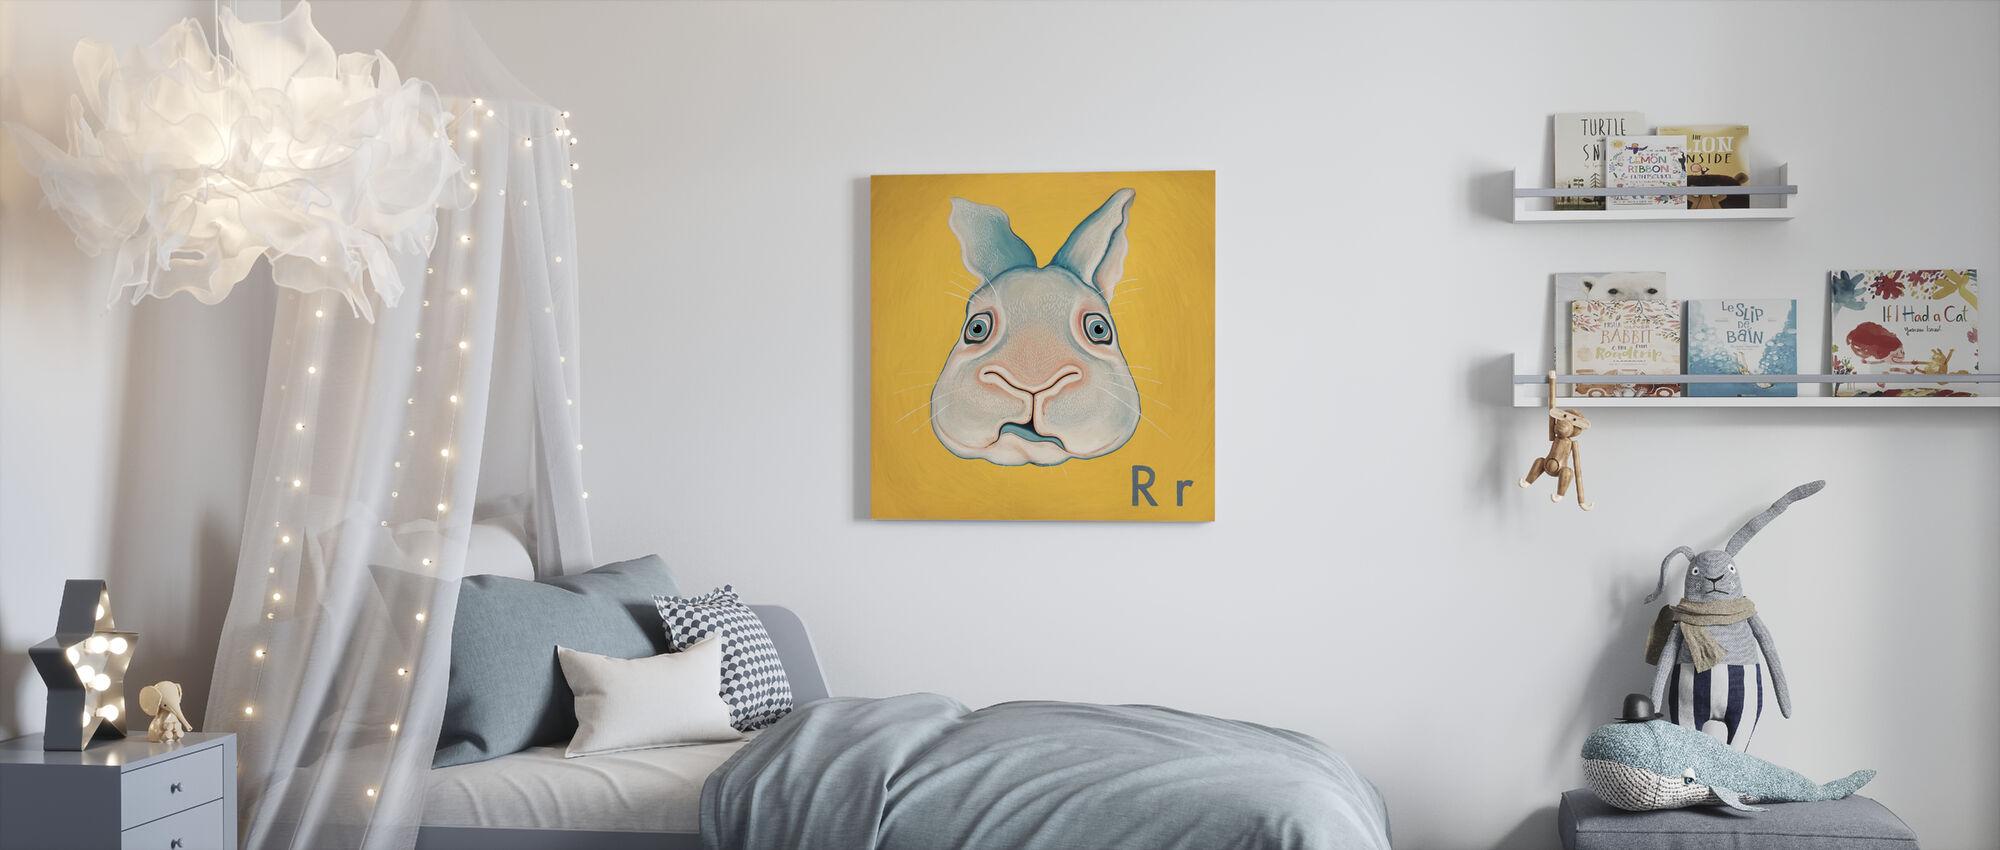 Rabbit with R - Canvas print - Kids Room